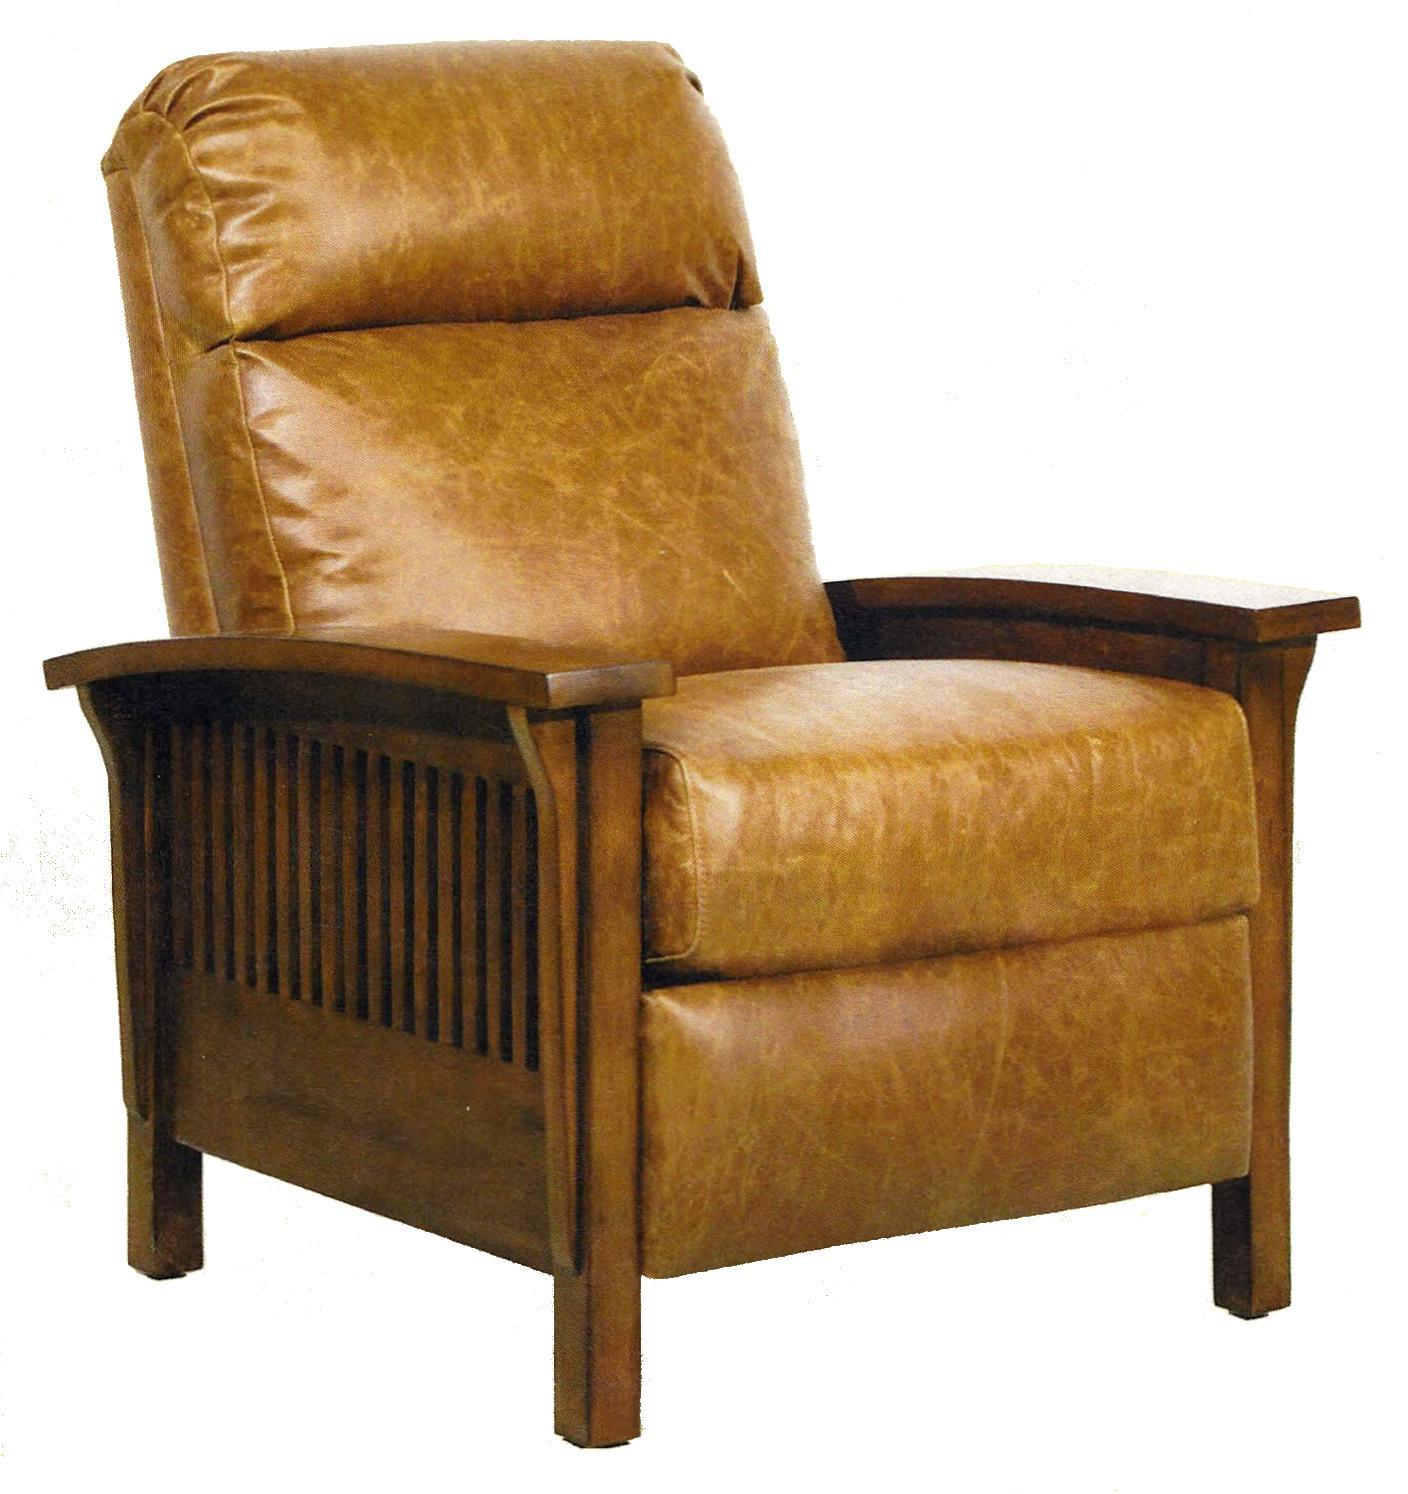 Vintage Reserve Craftsman II Recliner by Barcalounger at Sprintz Furniture